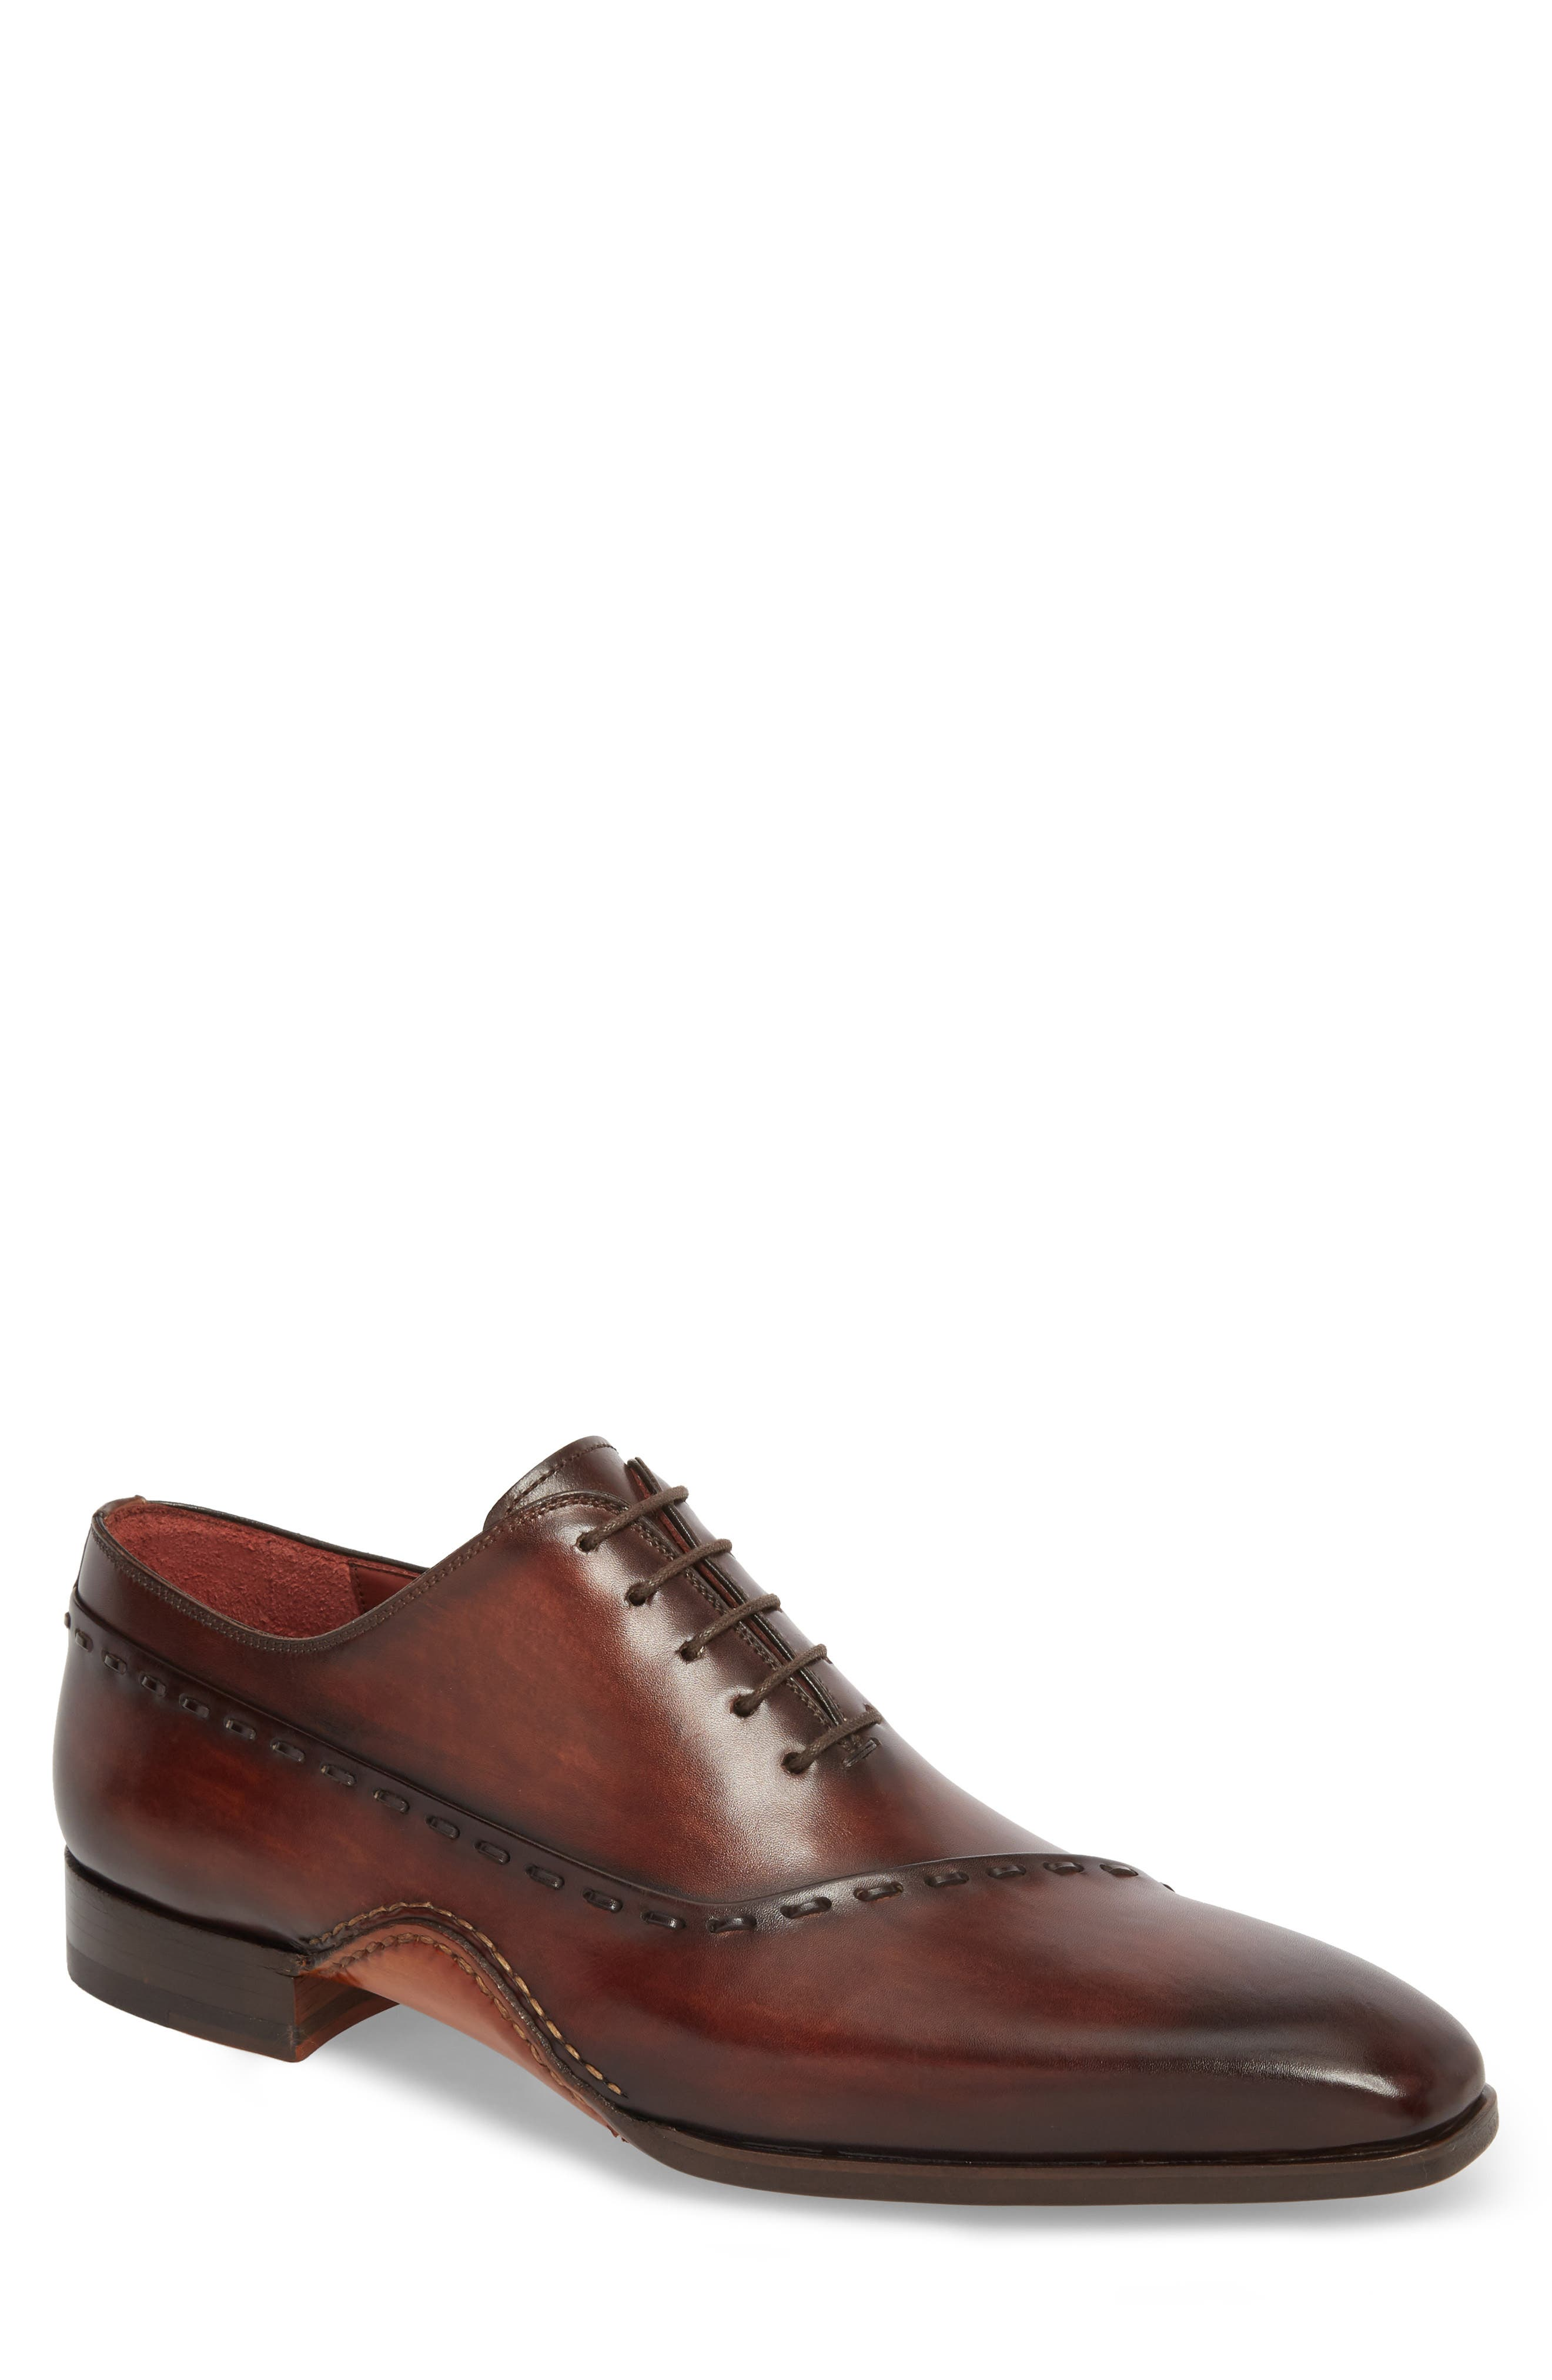 Kobe Asymmetrical Whole Cut Shoe,                             Main thumbnail 1, color,                             Mid-Brown Leather